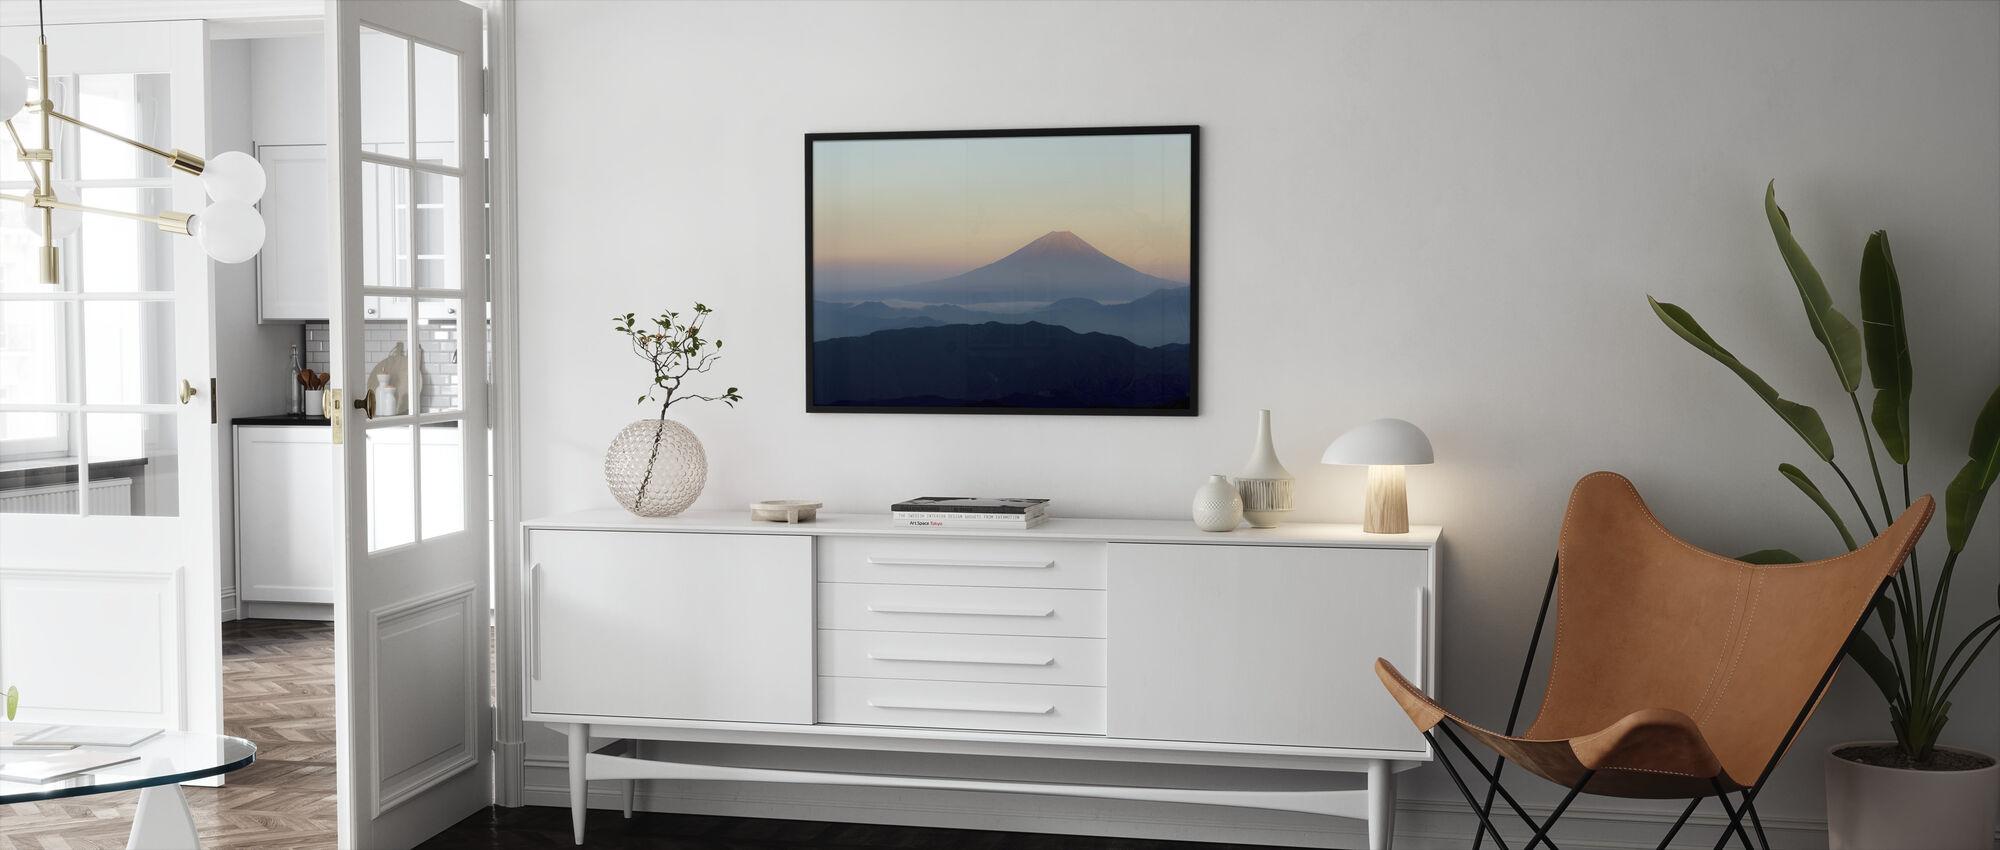 Mt. Fuji - Framed print - Living Room